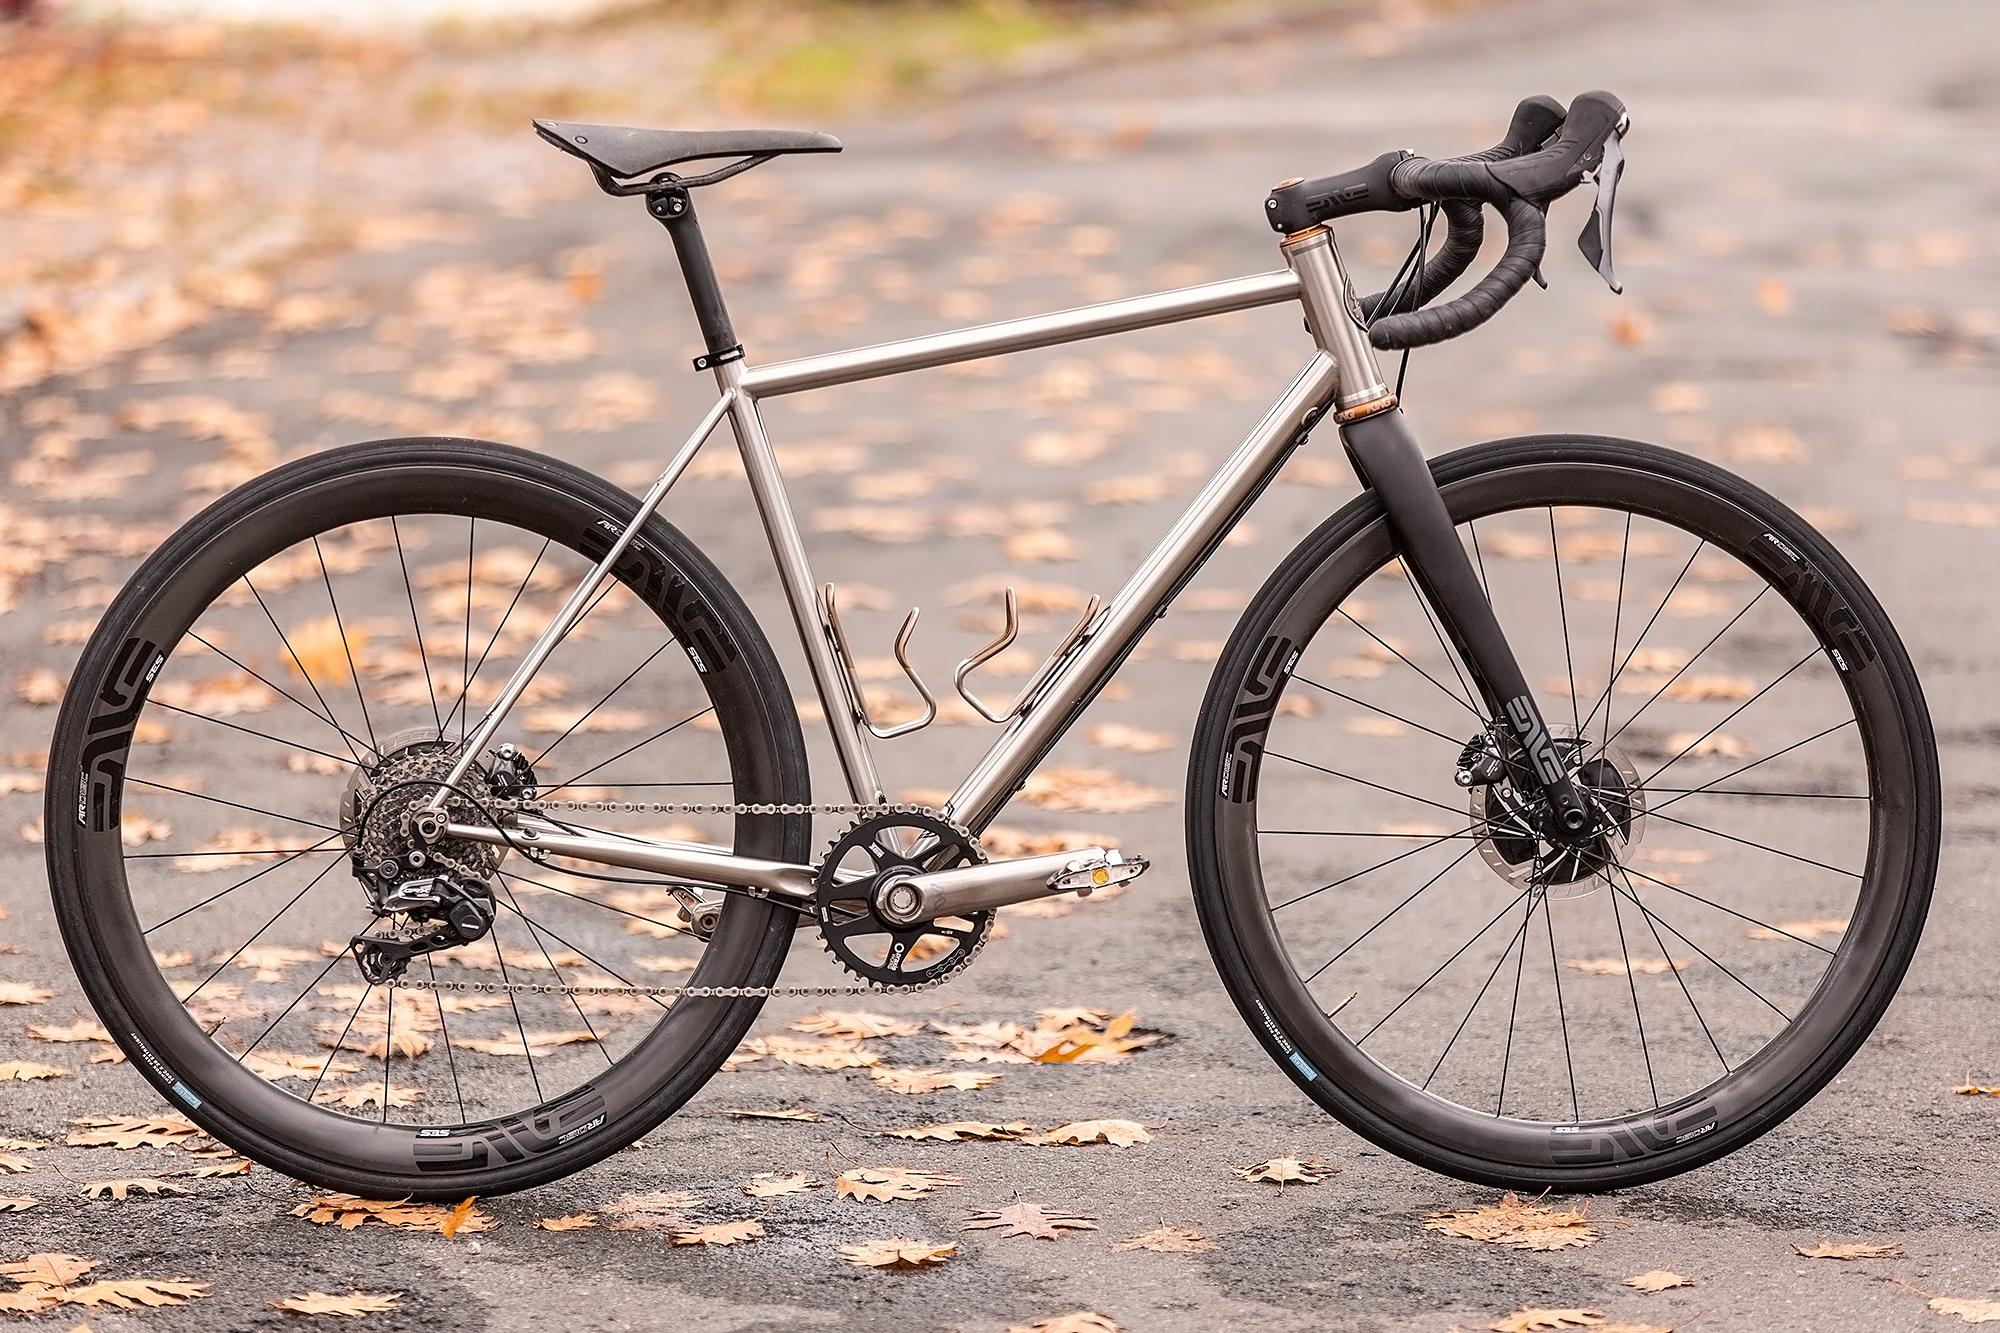 Julien's 2-11 Cycles MR4 Stainless Steel Gravel Bike